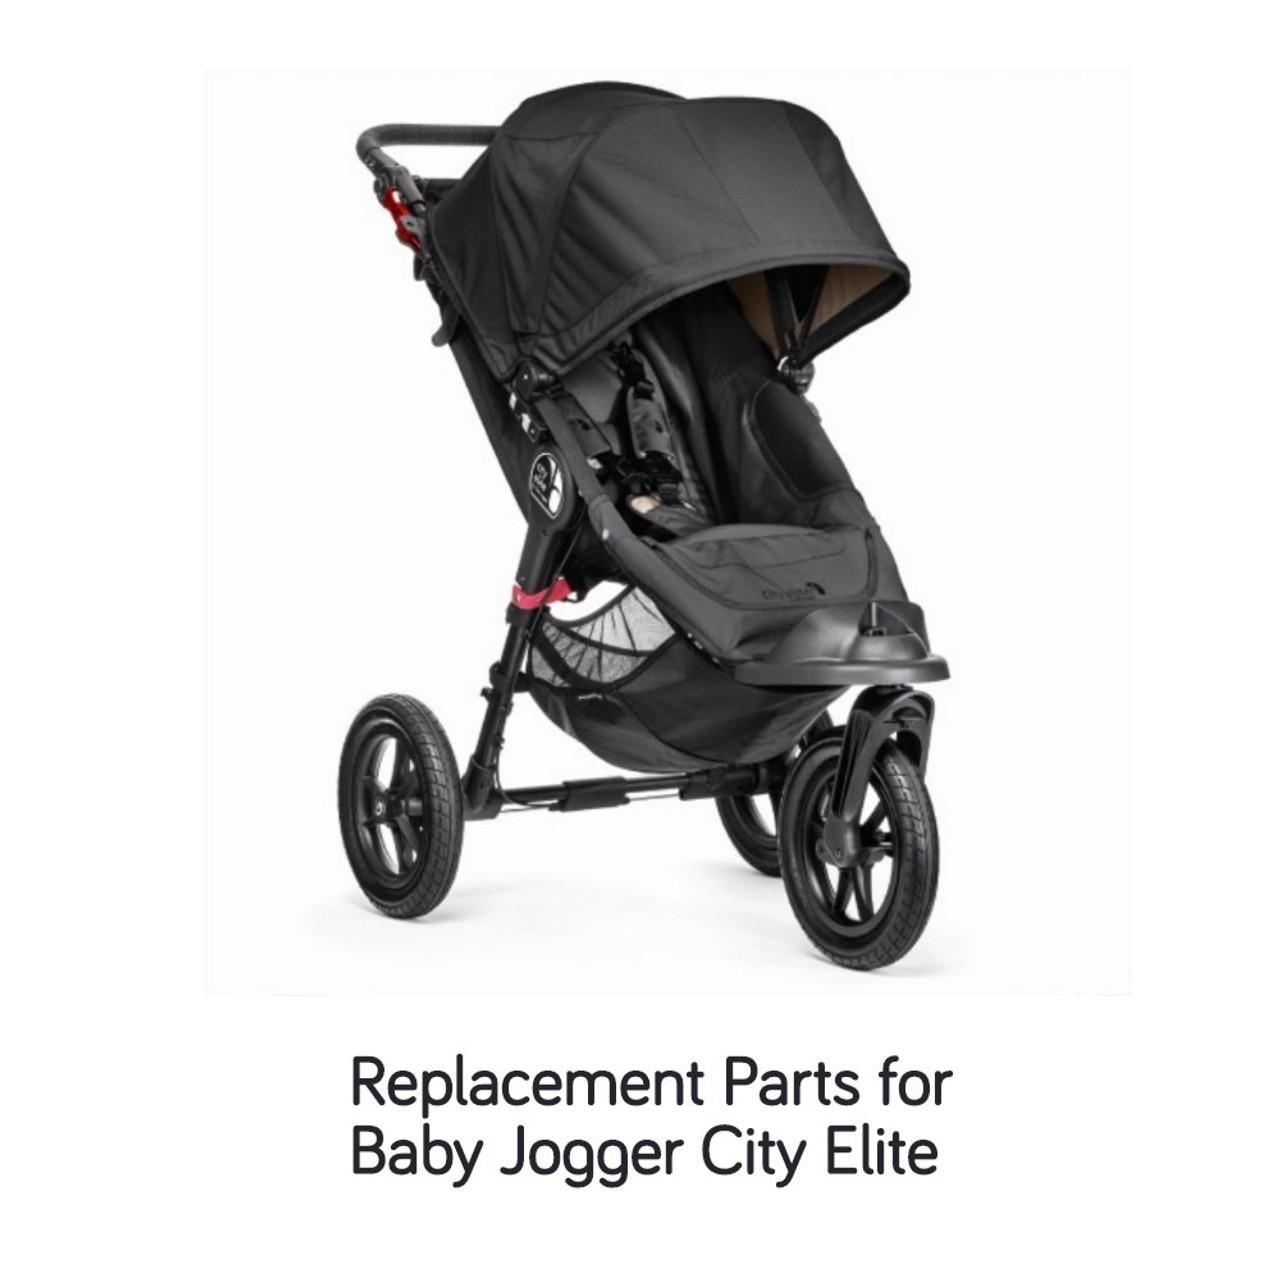 Baby Jogger City Elite Crotch and Shoulder Pad Set - Black